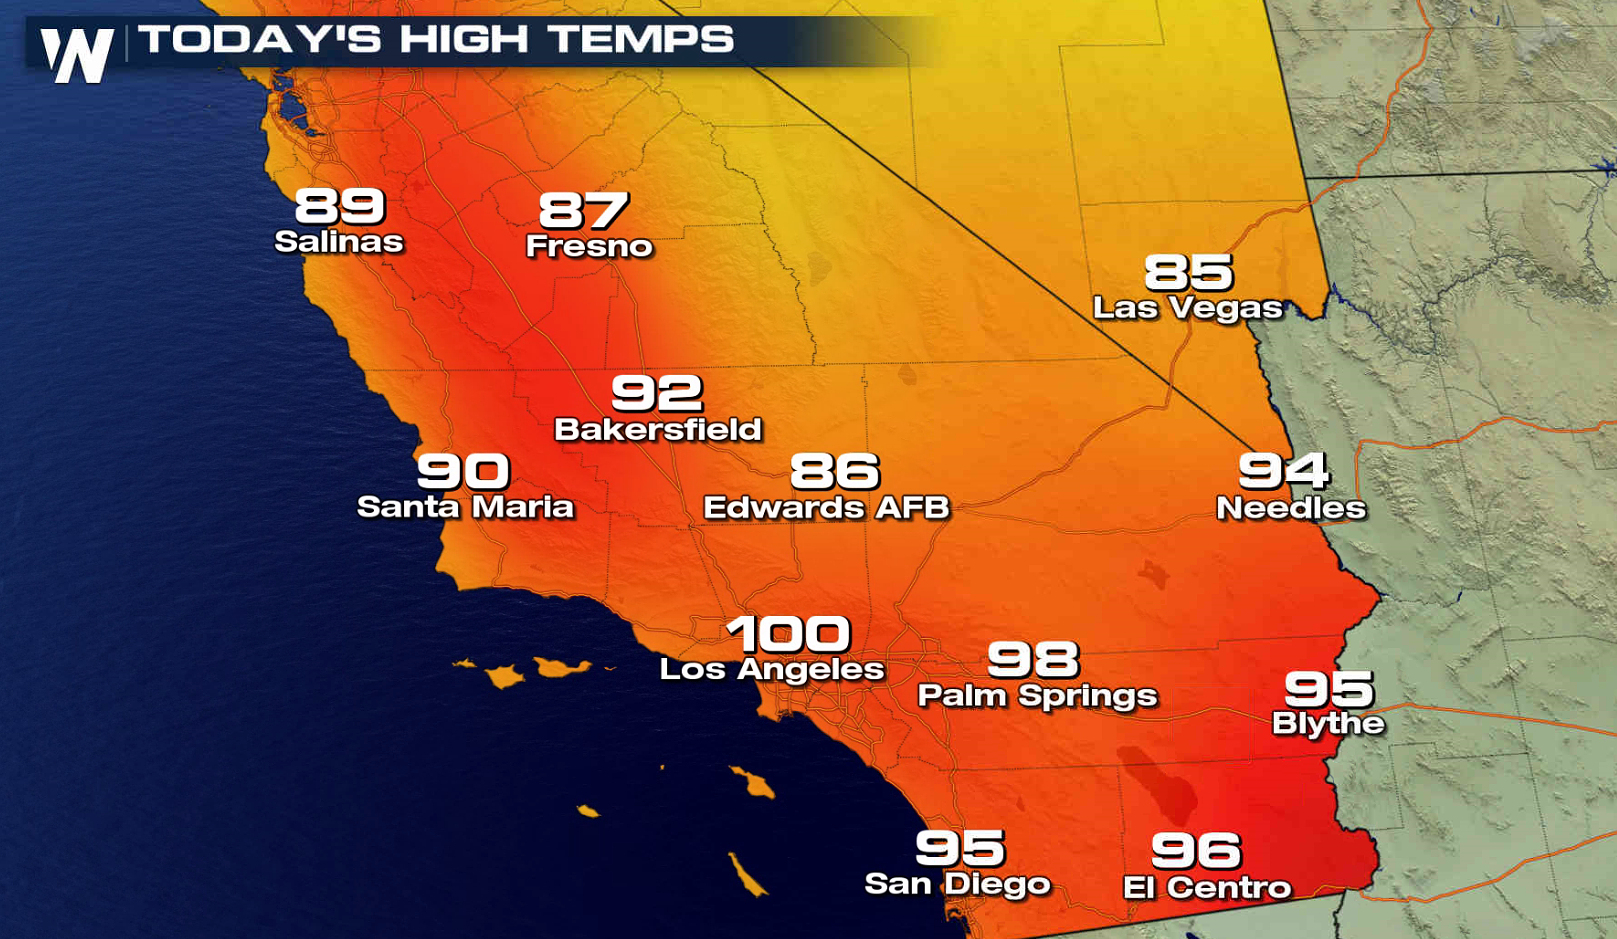 Record Heat Southern California California Map With Cities - Heat Map Southern California